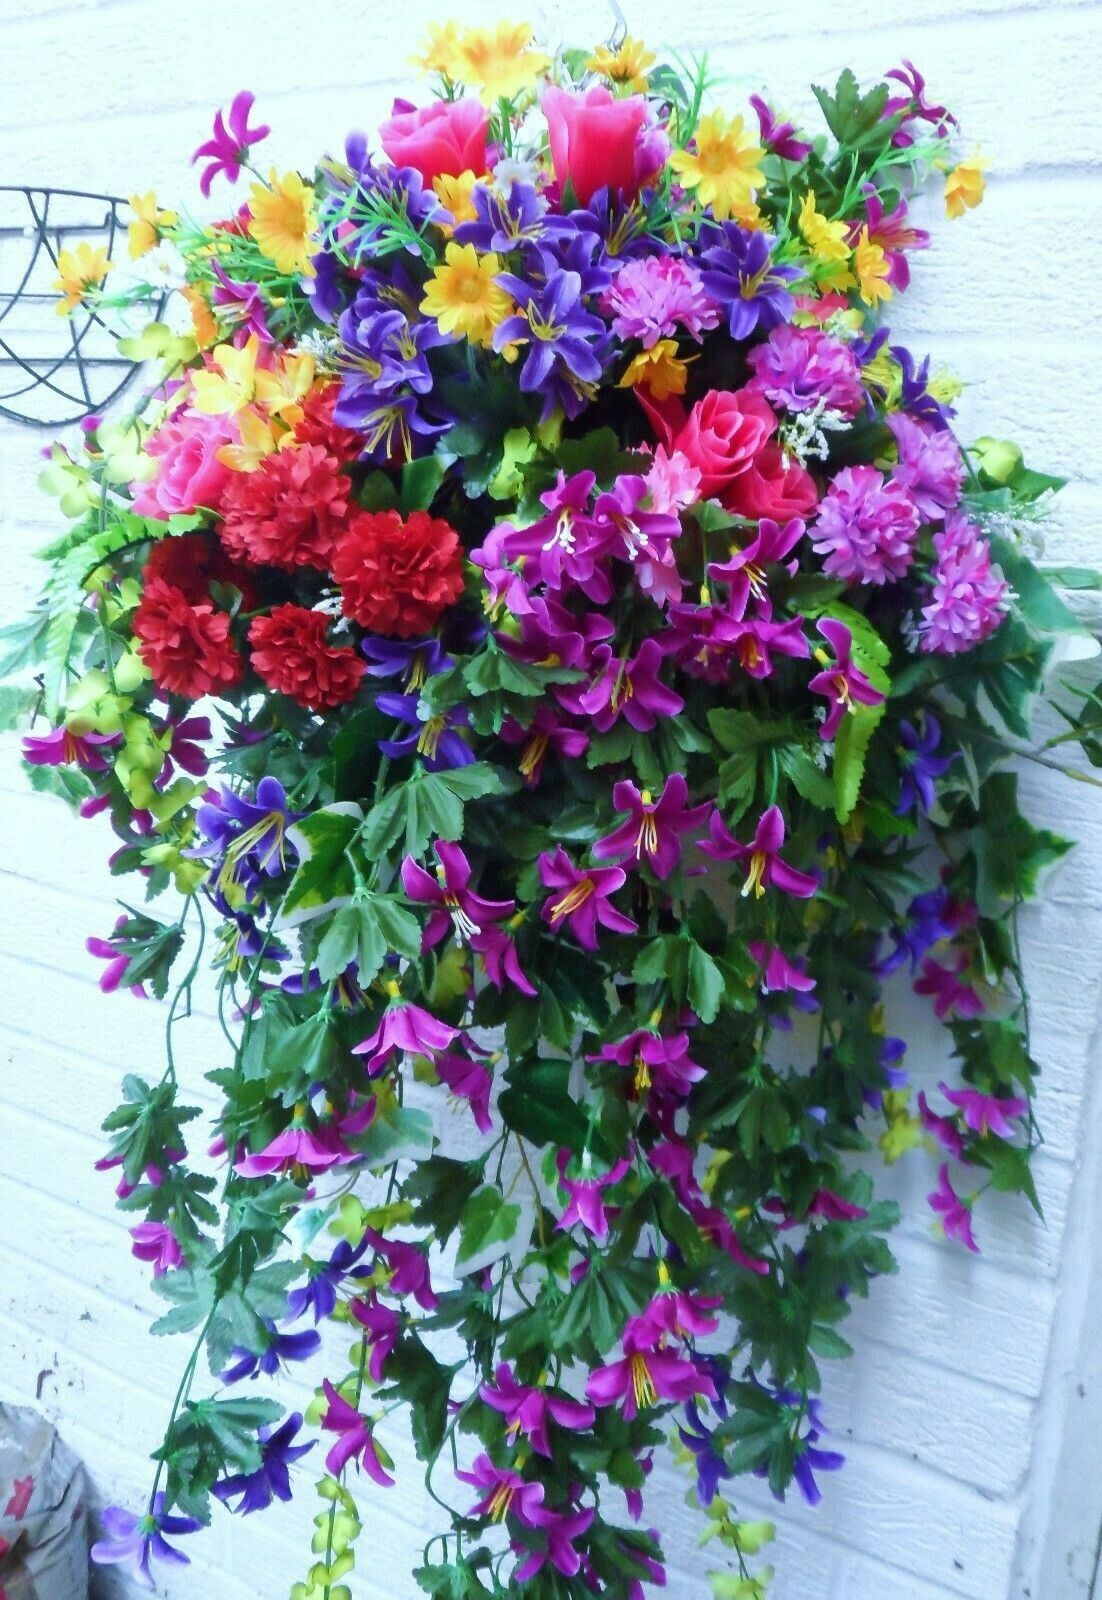 SUPERIOR EX LARGE ARTIFICIAL FLOWER HANGING BASKET  BEAUTIFUL